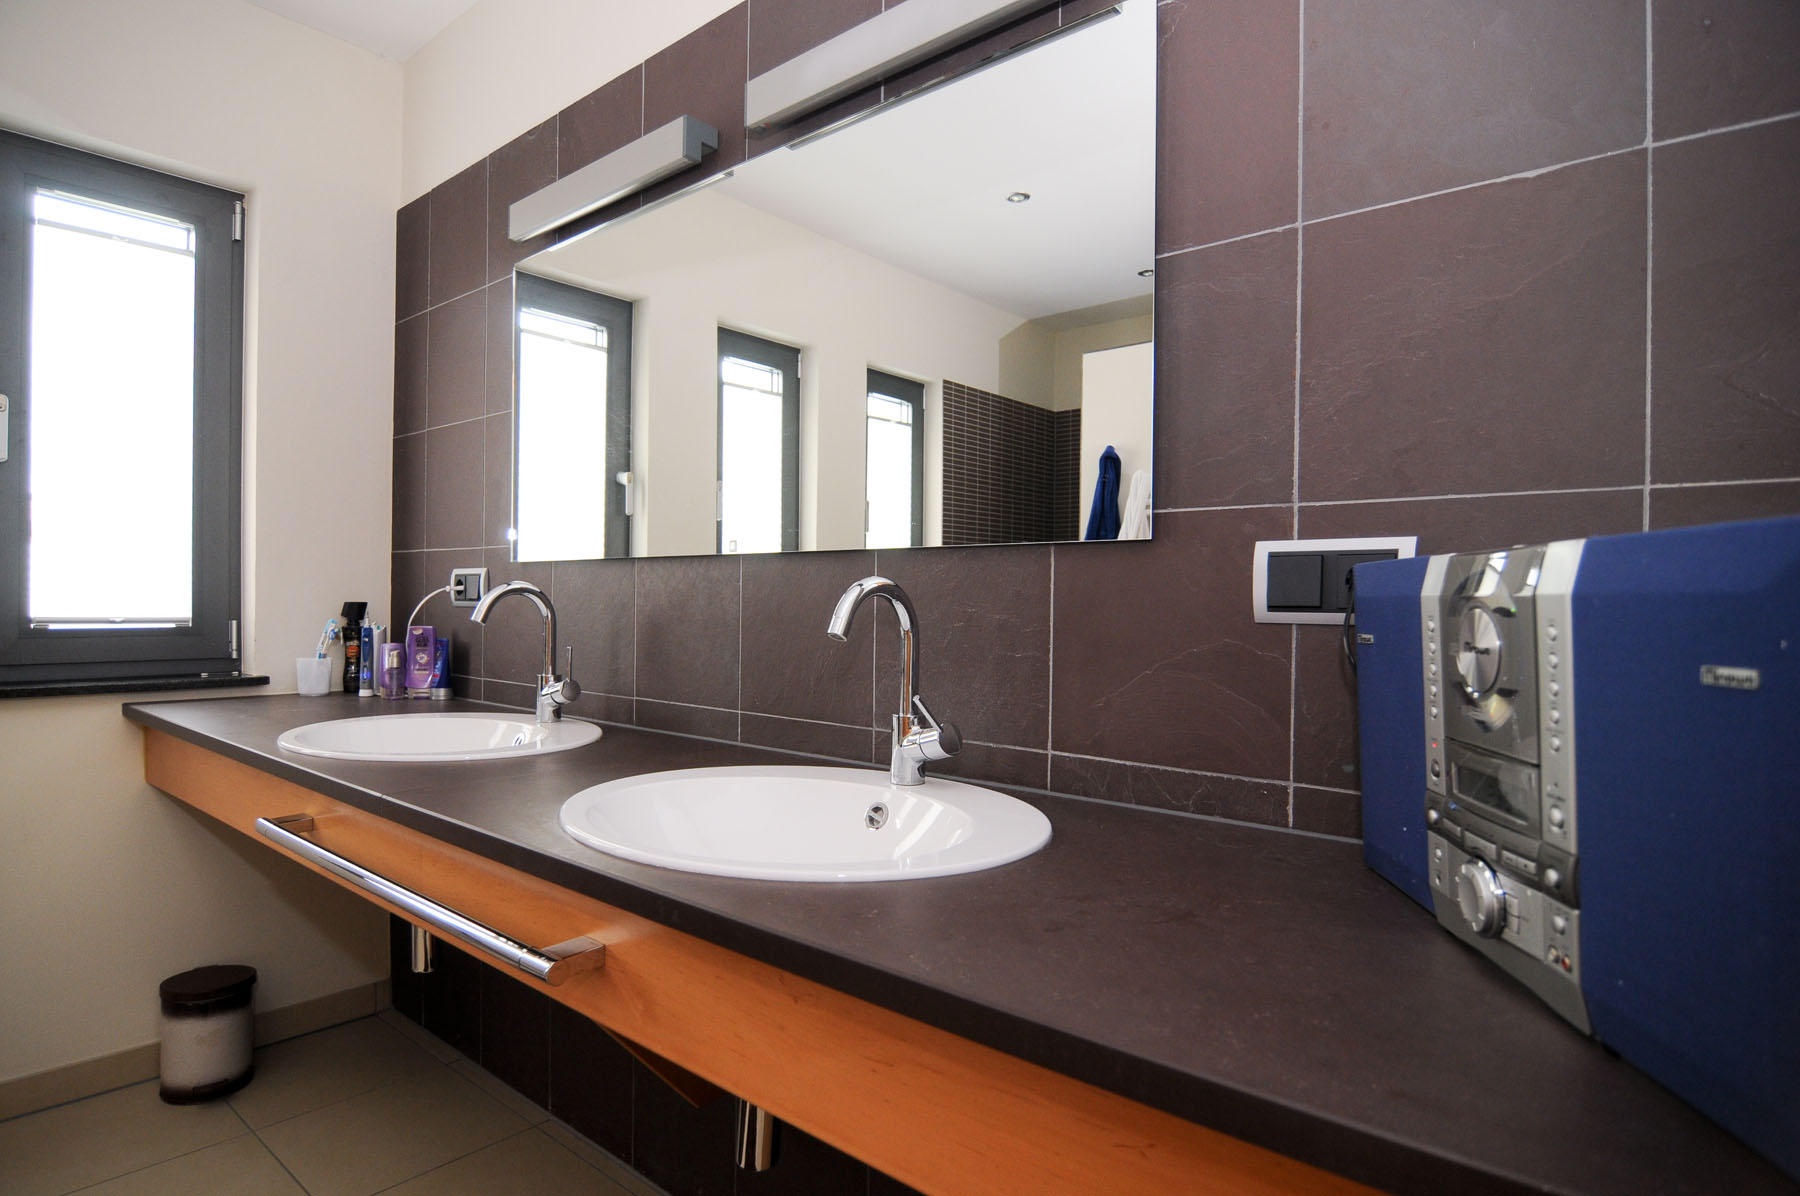 waschtischplatte schiefer. Black Bedroom Furniture Sets. Home Design Ideas